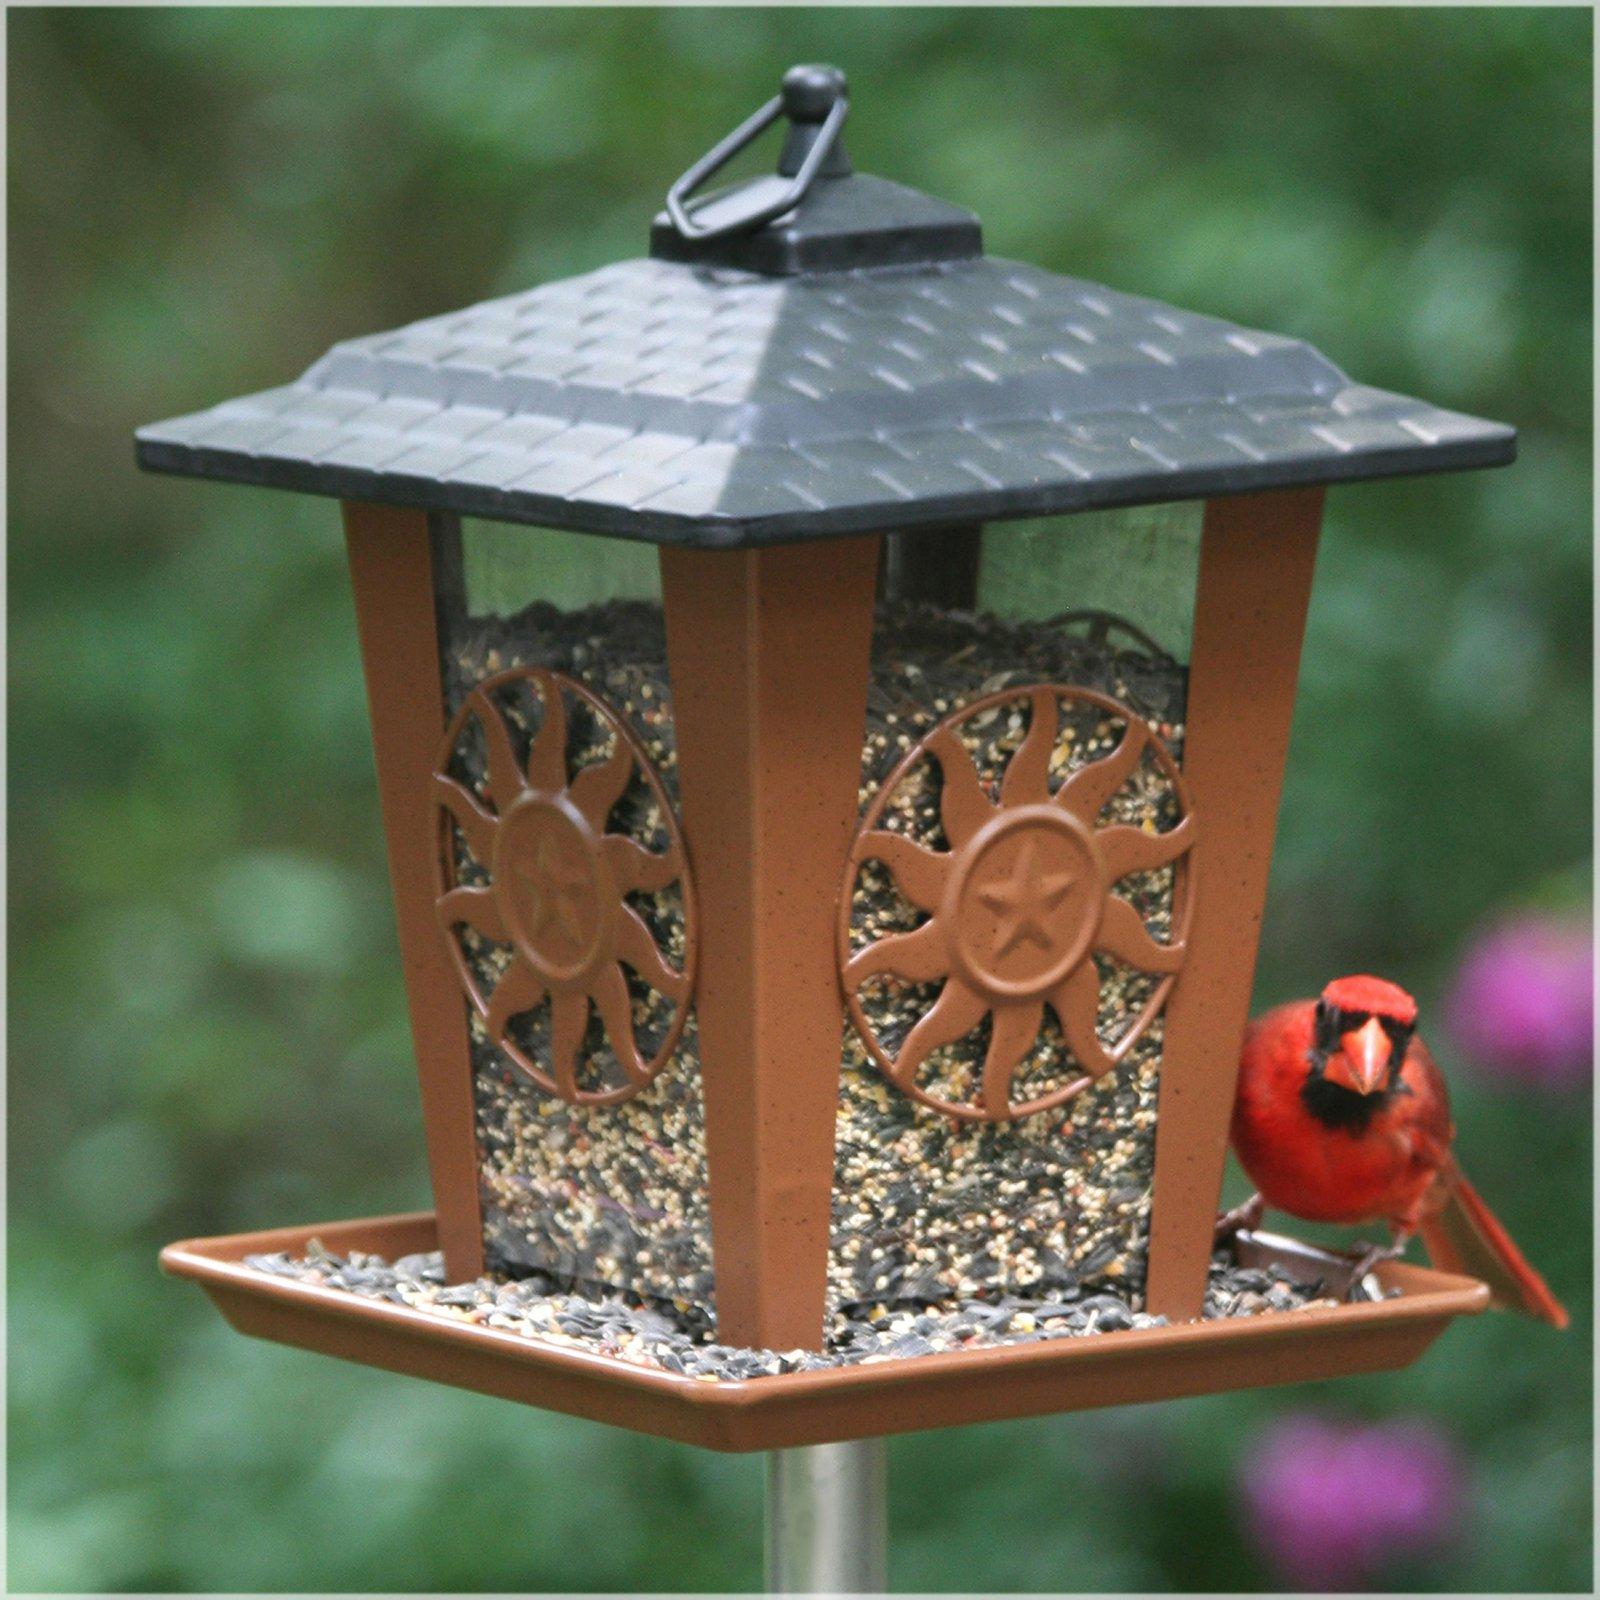 Perky-Pet Sun and Star Lantern Wild Bird Feeder